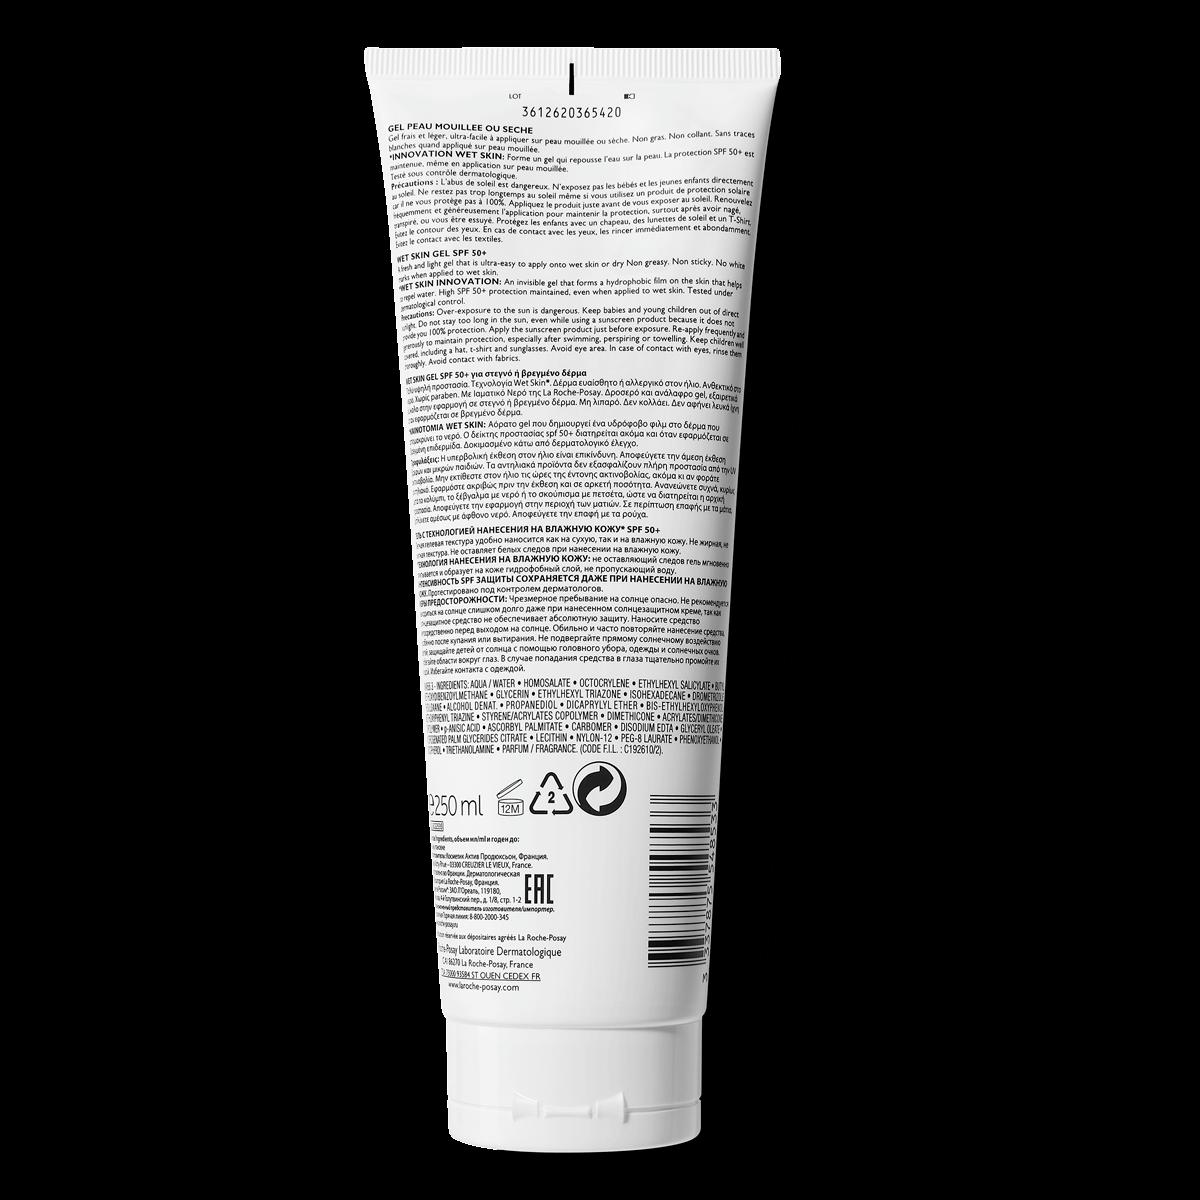 La Roche Posay ProductPage Sun Anthelios XL Wet Skin Gel Spf50 250ml 3